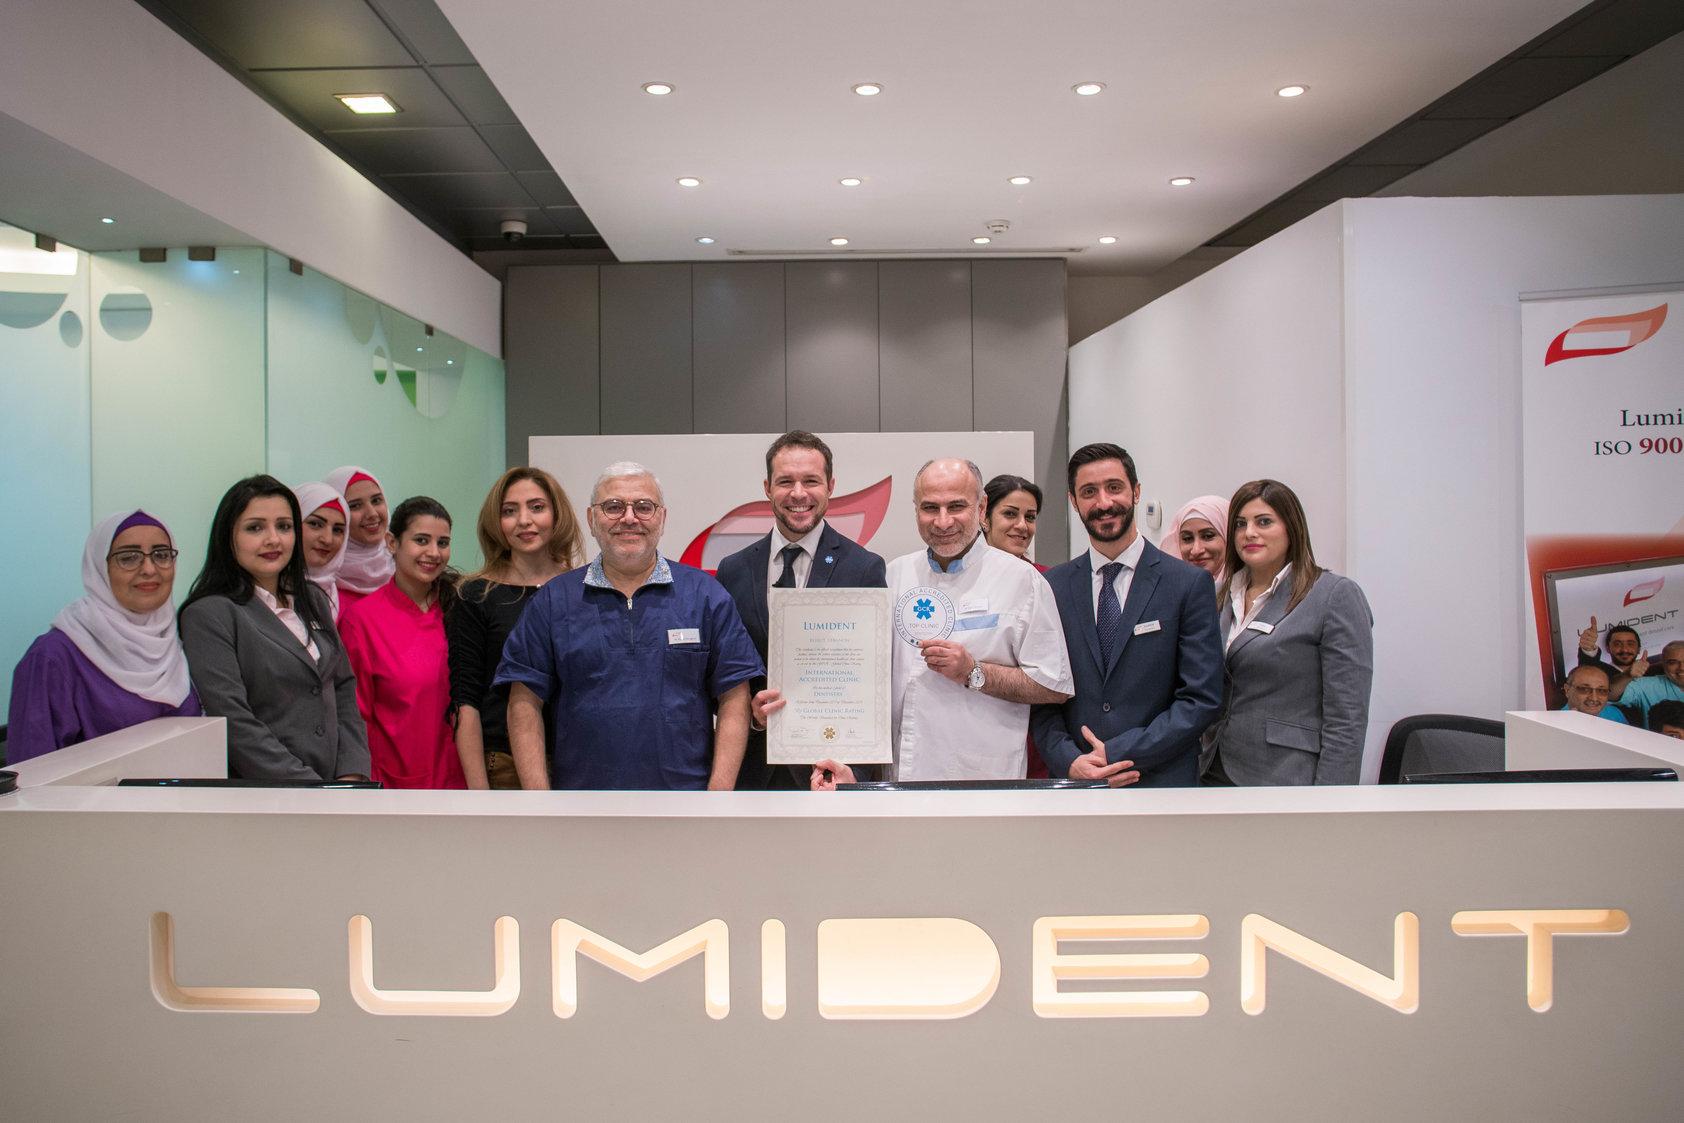 Clinic team at Lumident